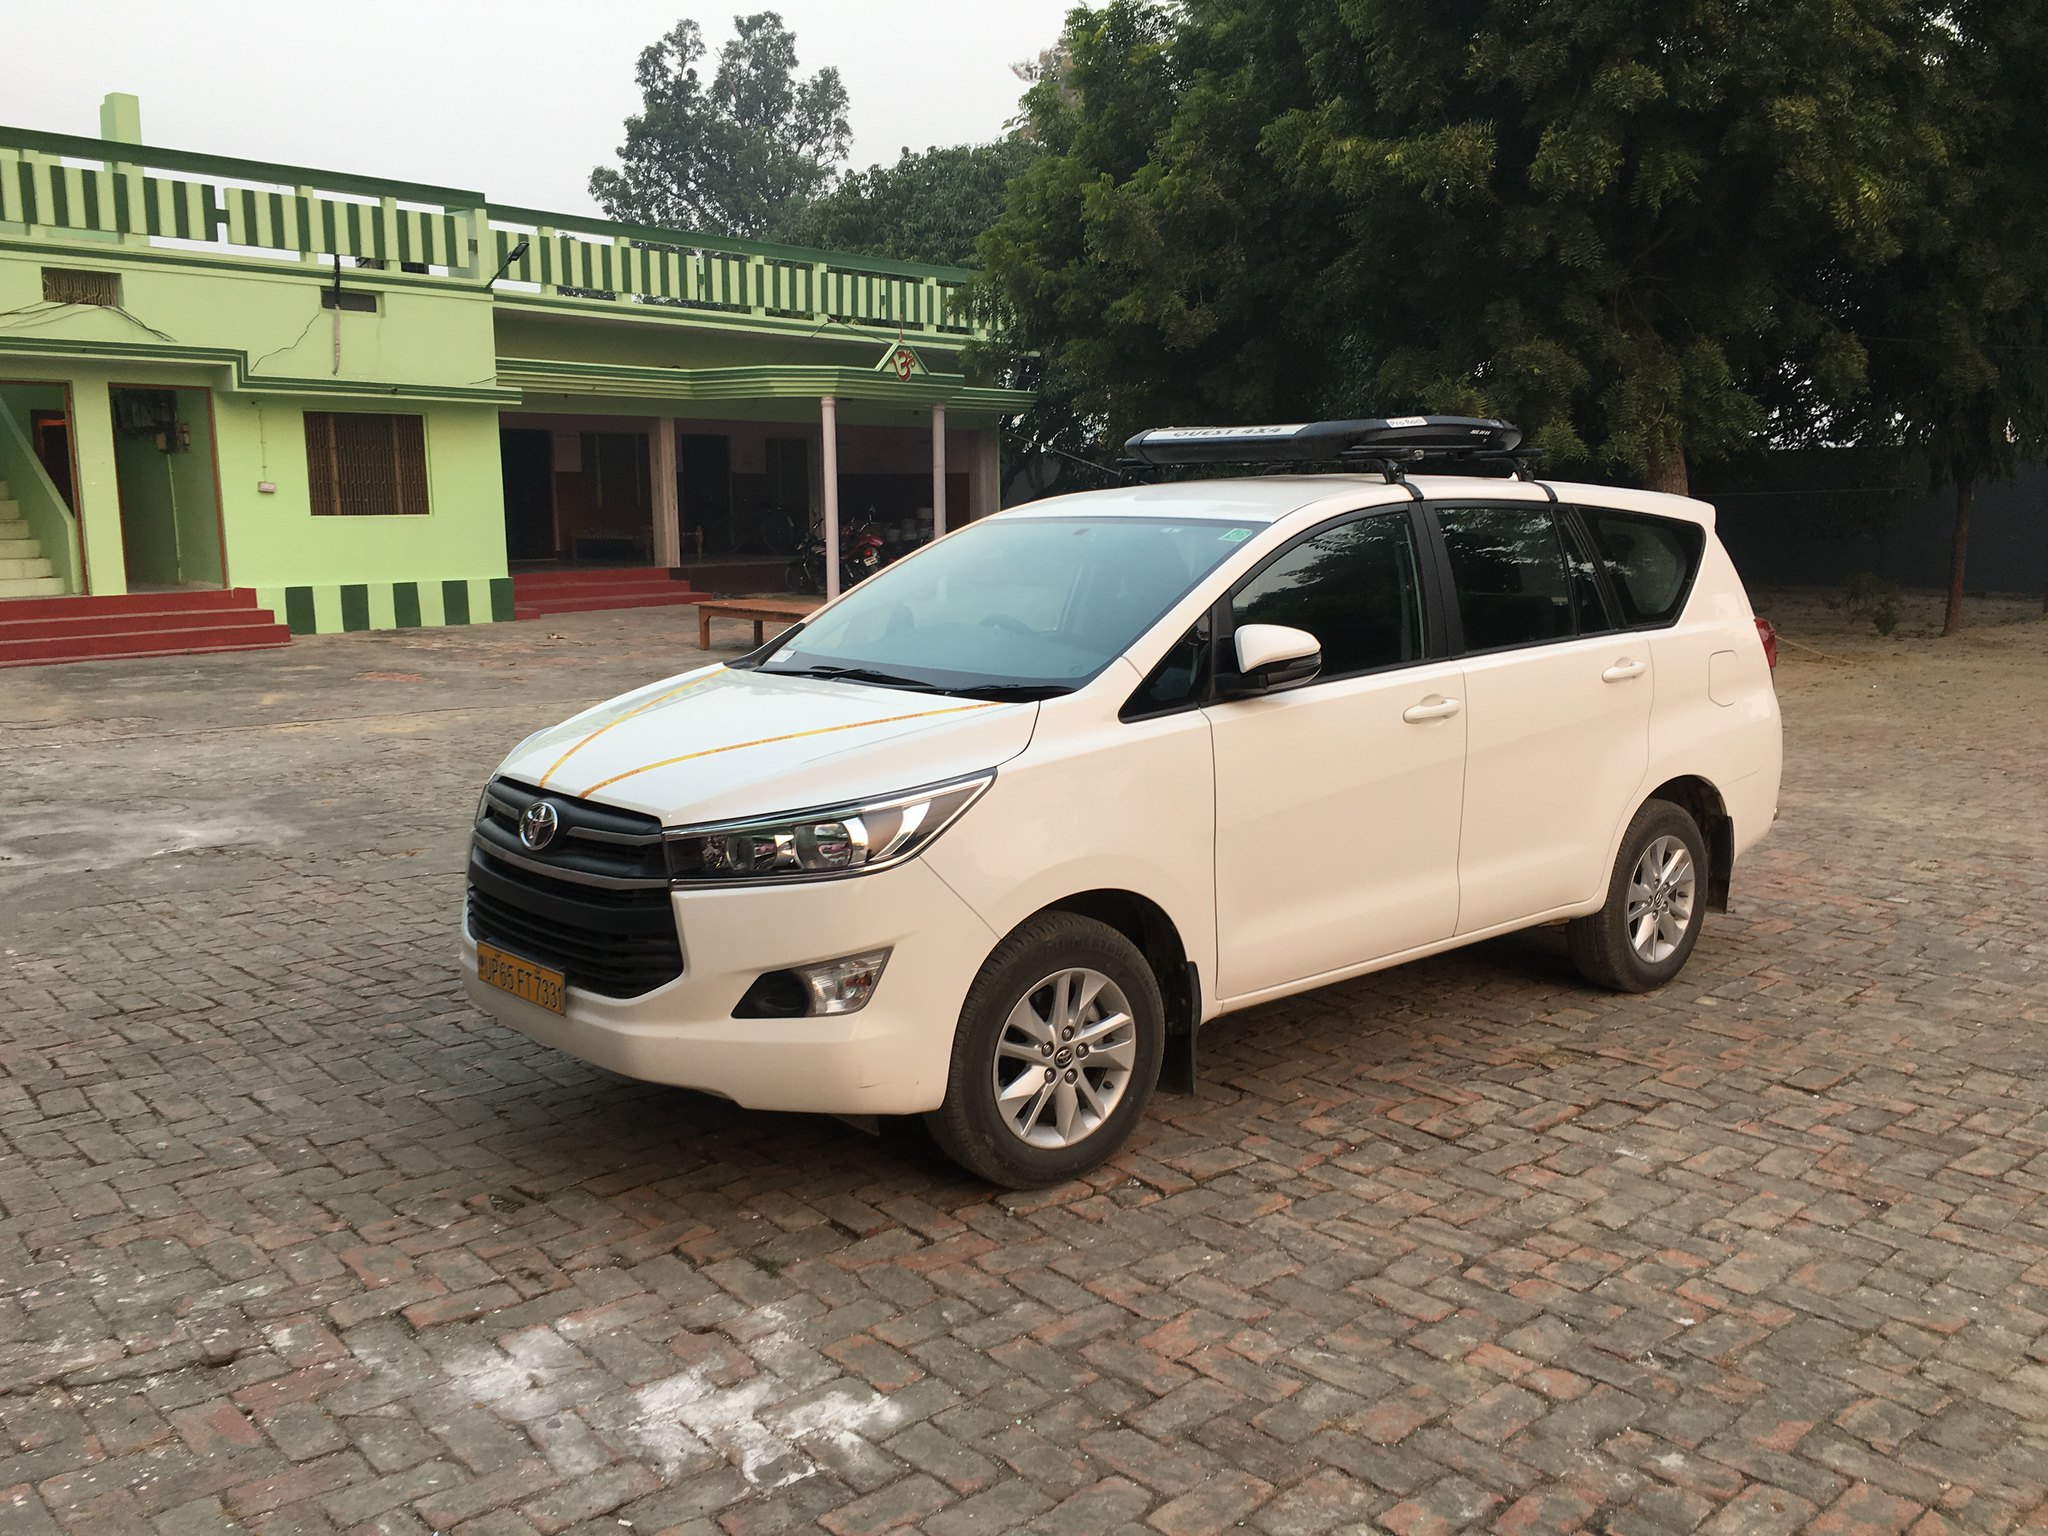 Hire Luxury Wedding Car On Rent In Varanasi Vidhan Travels